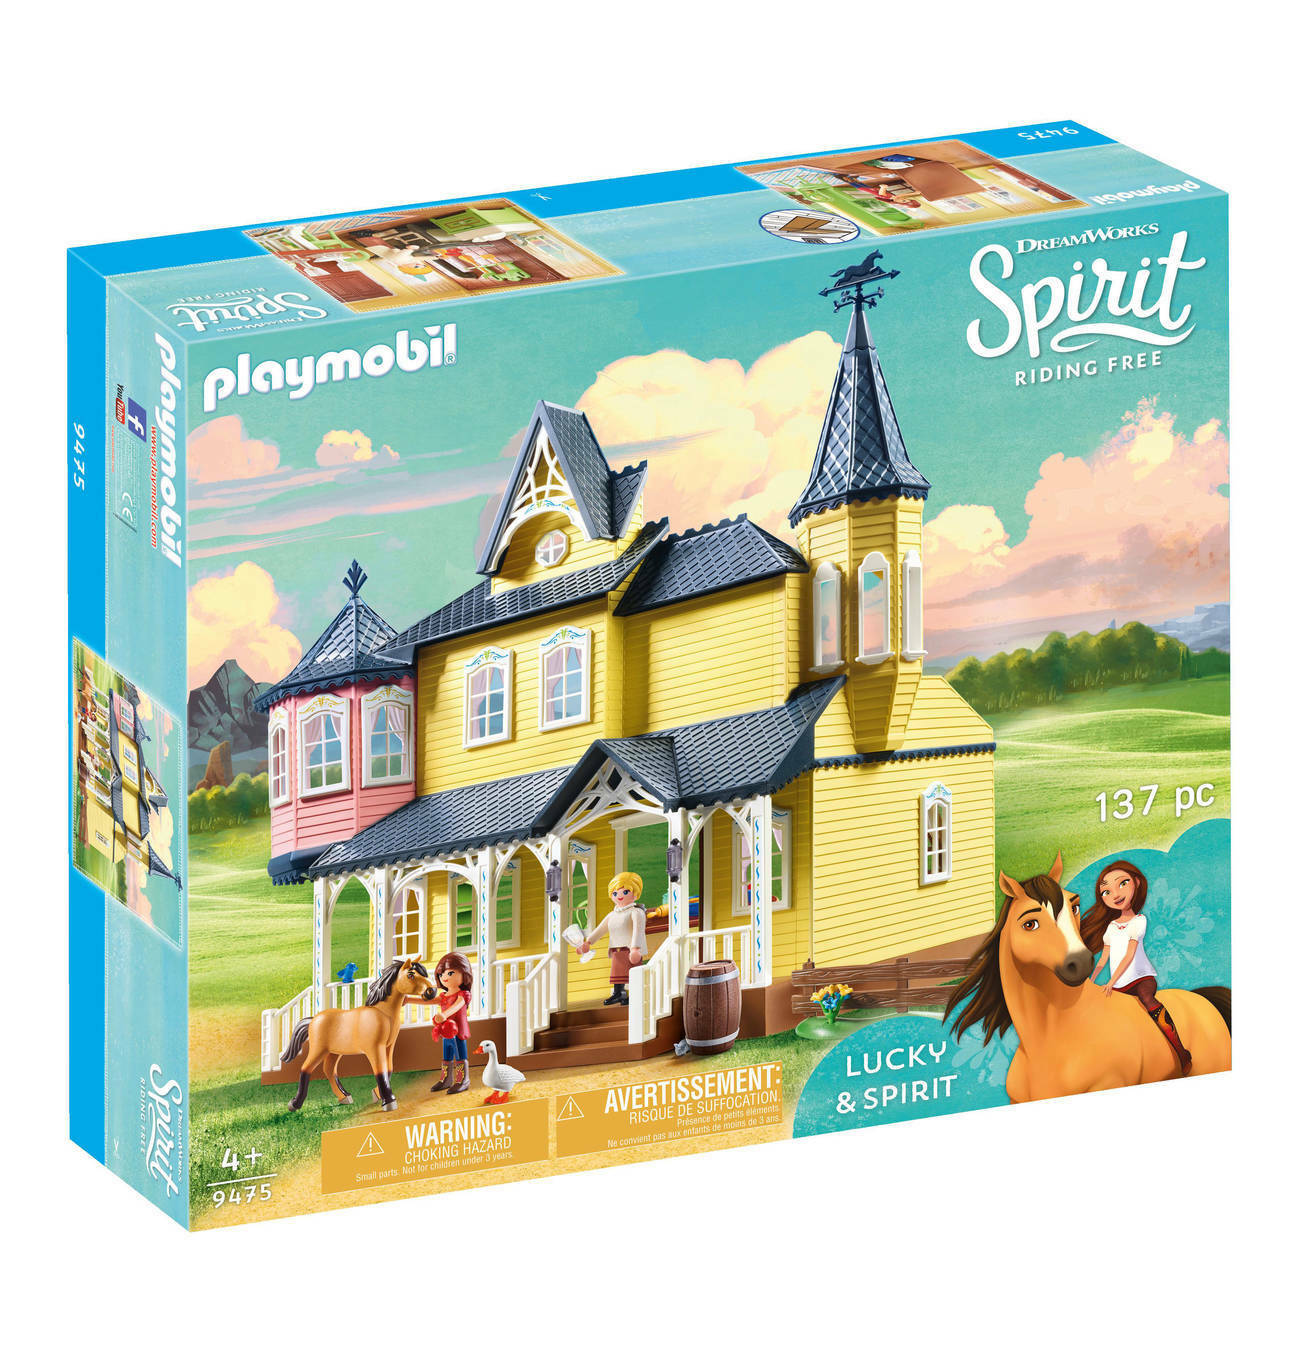 PLAYMOBIL 9475 BOTTIGLIA SPIRITO Riding libero agriturismi 100% NUOVI/SIGILLATI